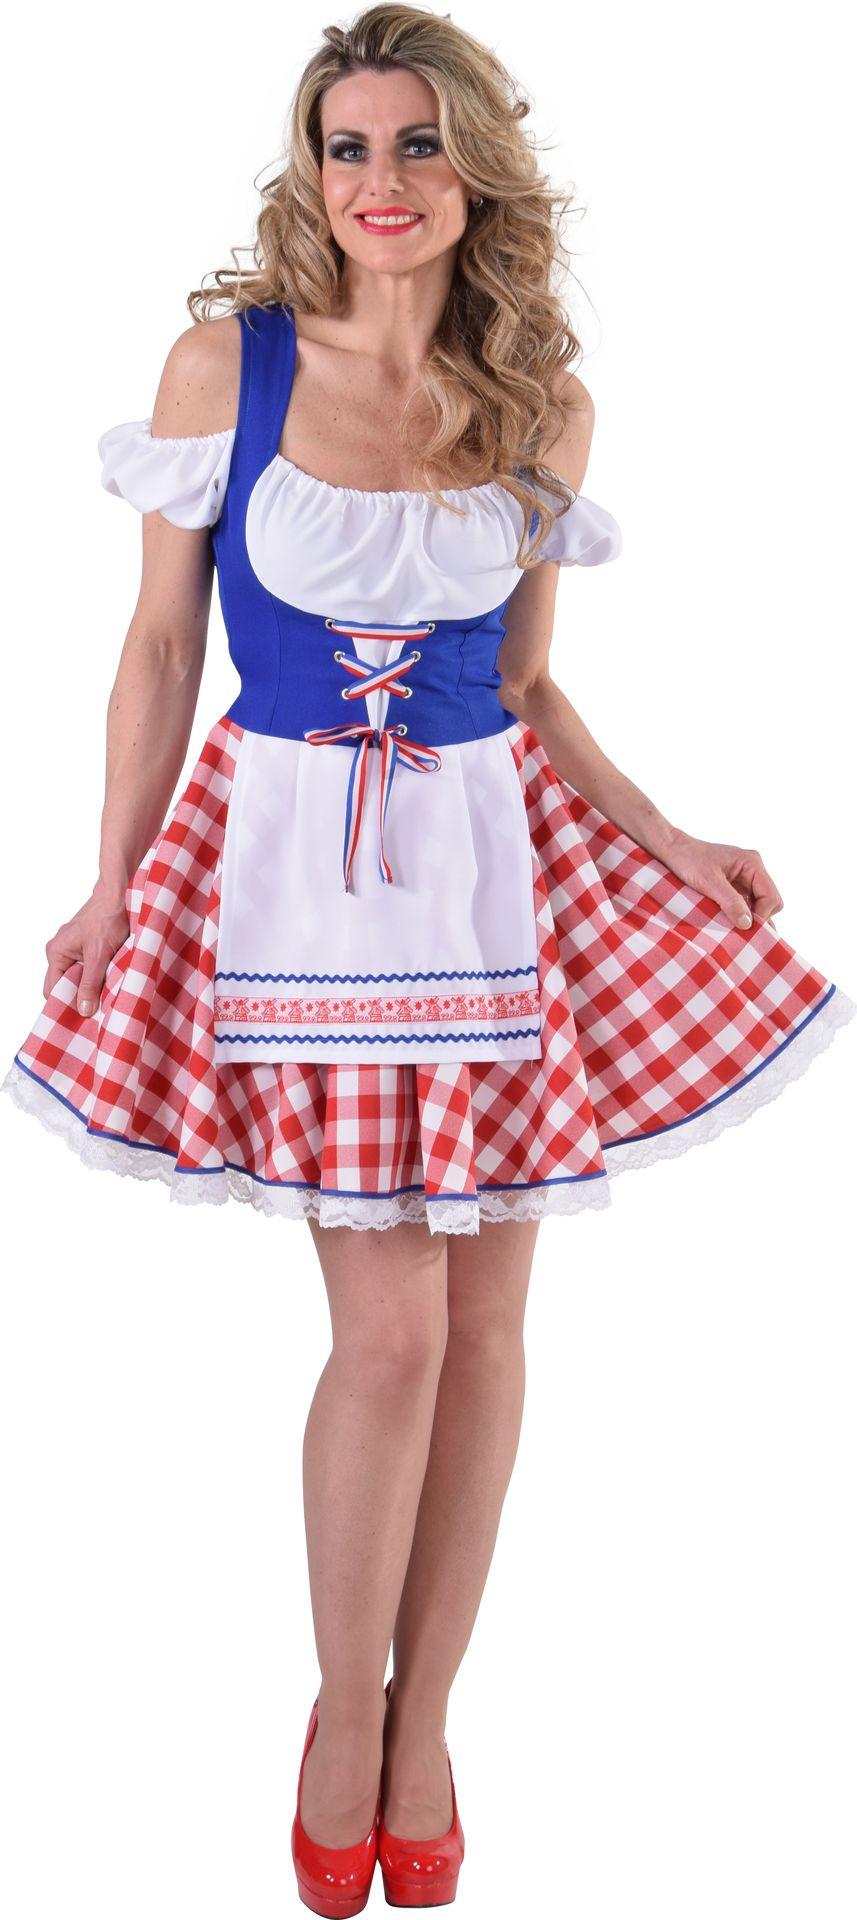 Hollandse jurk dames